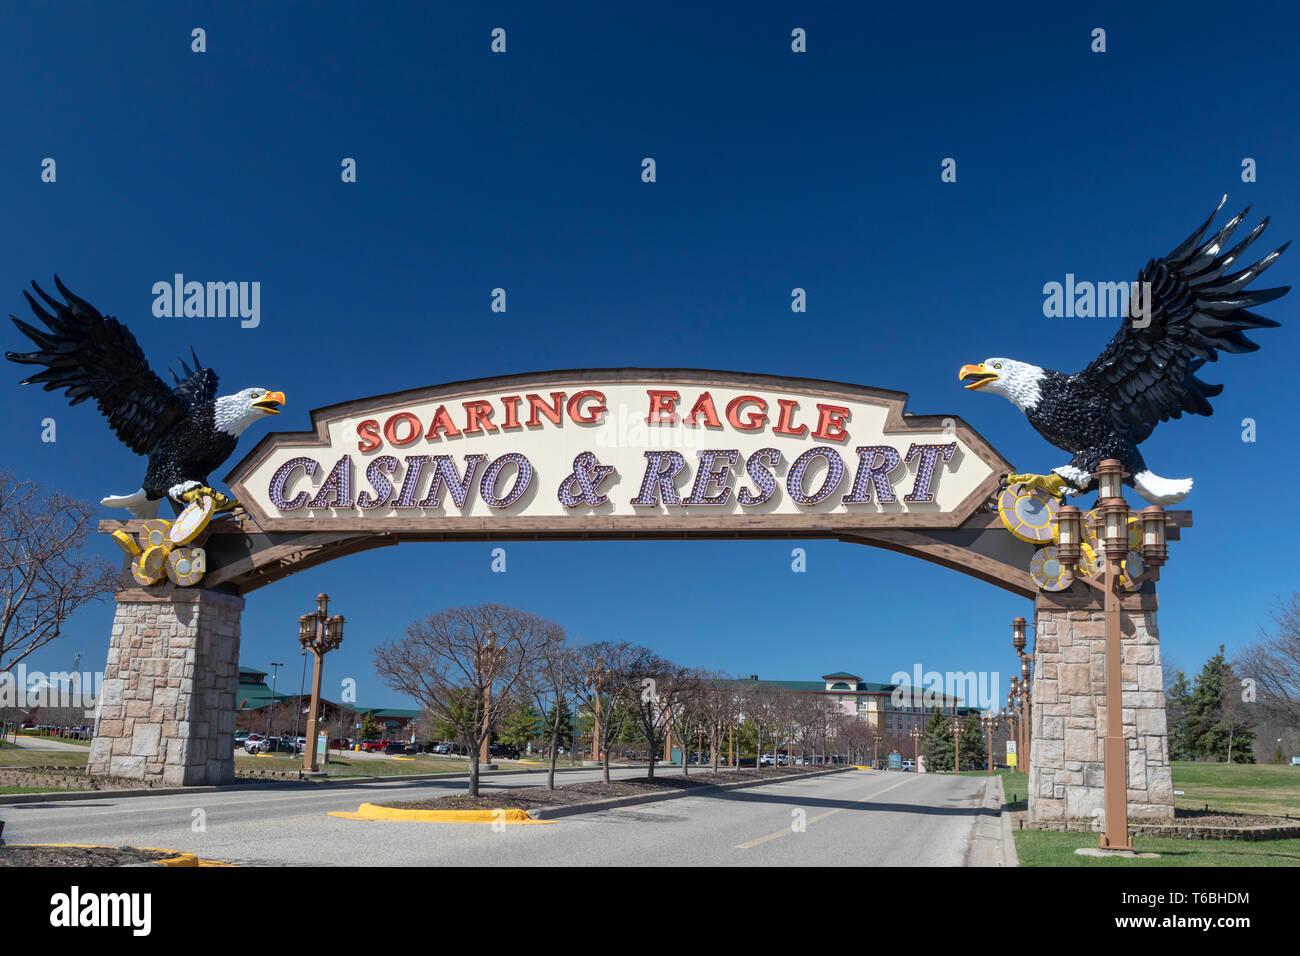 Mt. Agréable, Michigan - Le Soaring Eagle Casino and Resort, exploité par la tribu indienne Saginaw Chippewa du Michigan. Photo Stock